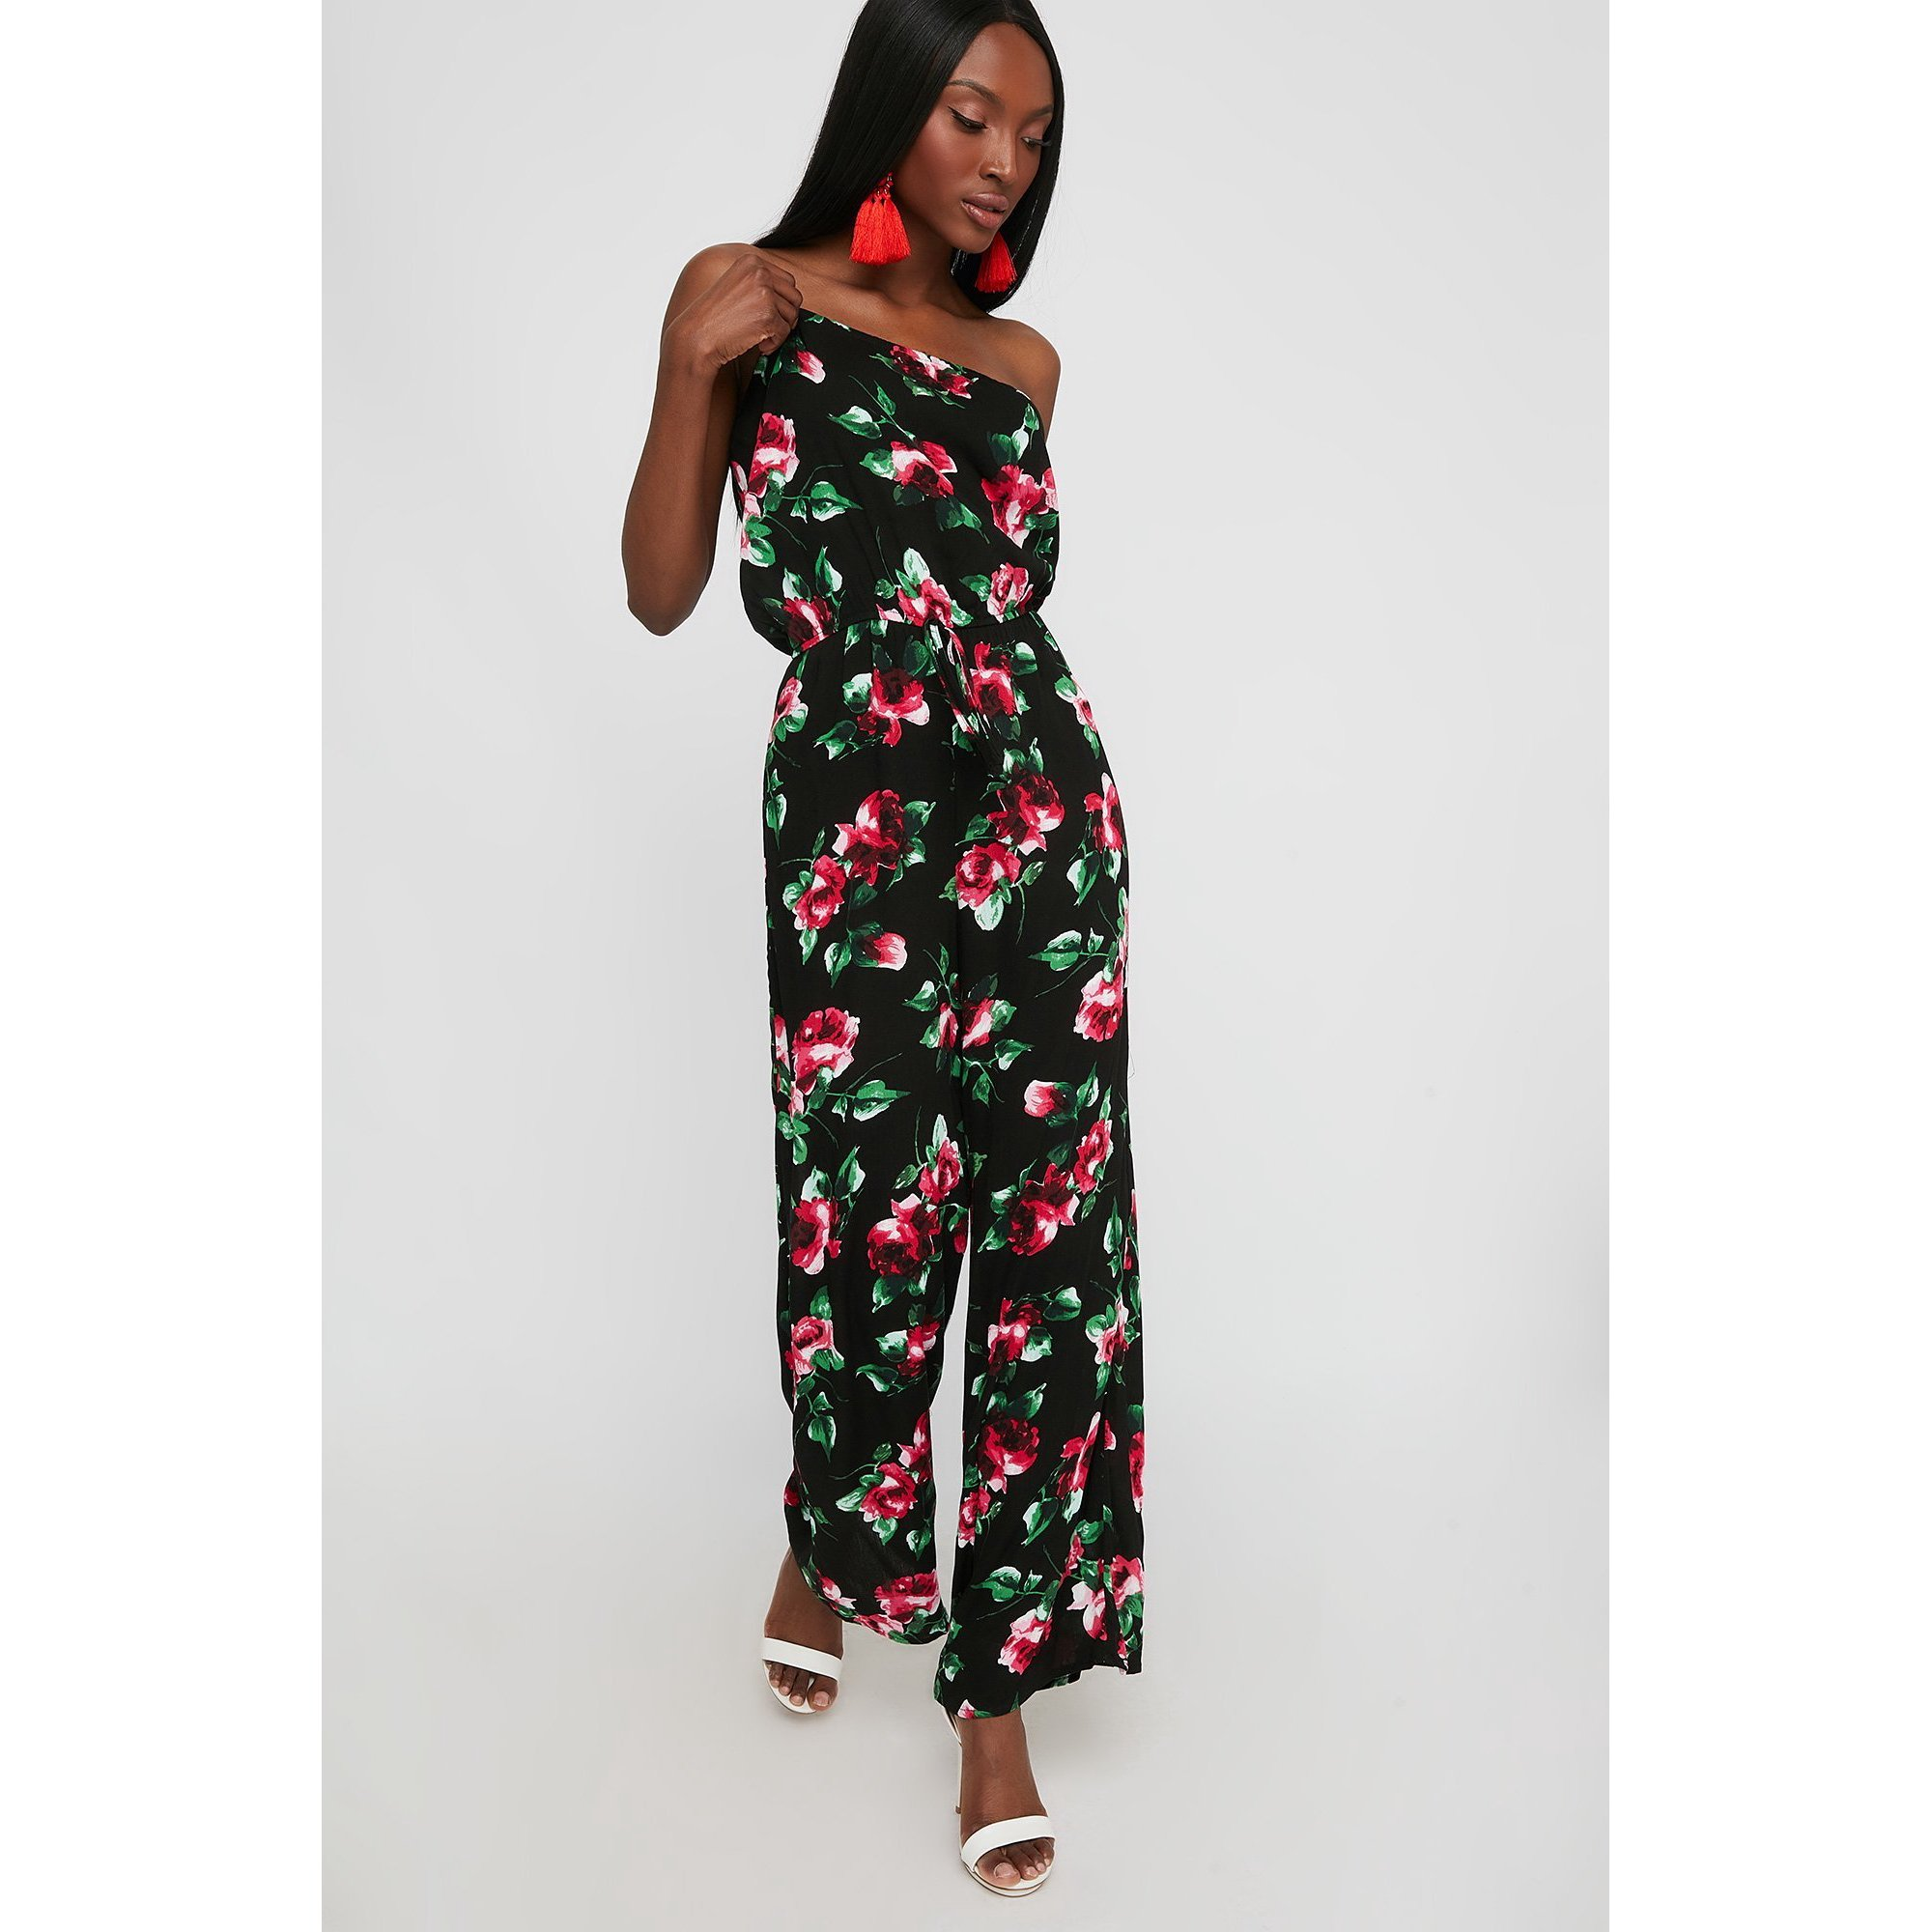 57e5e0b5b80 Urban Planet Women s Floral Tube Wide Leg Jumpsuit